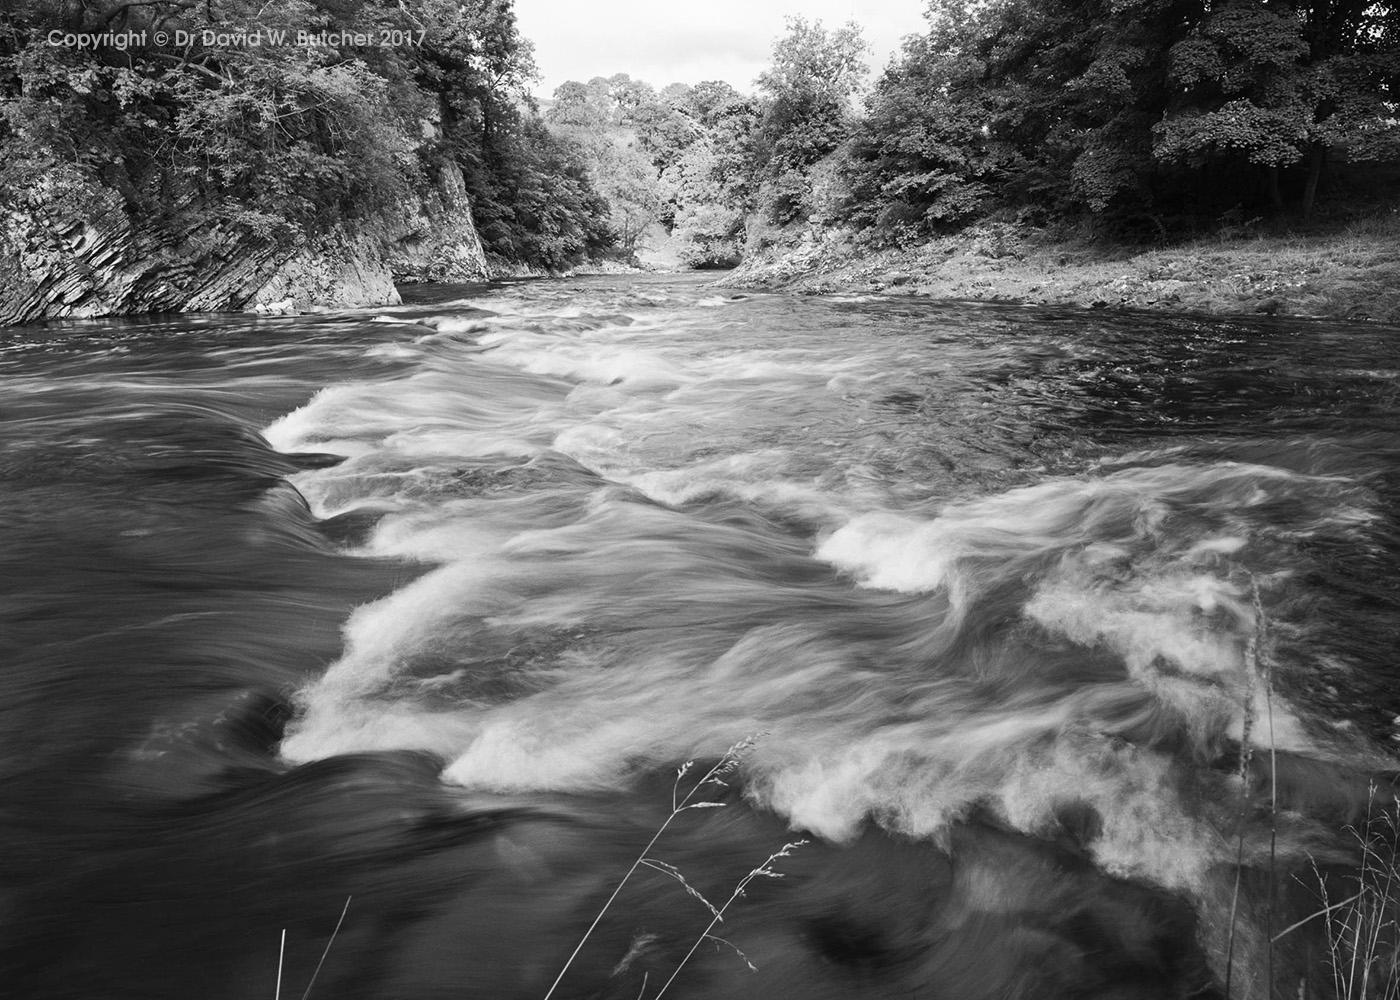 River Wharfe at Loup Scar, Grassington, Wharfedale, Yorkshire